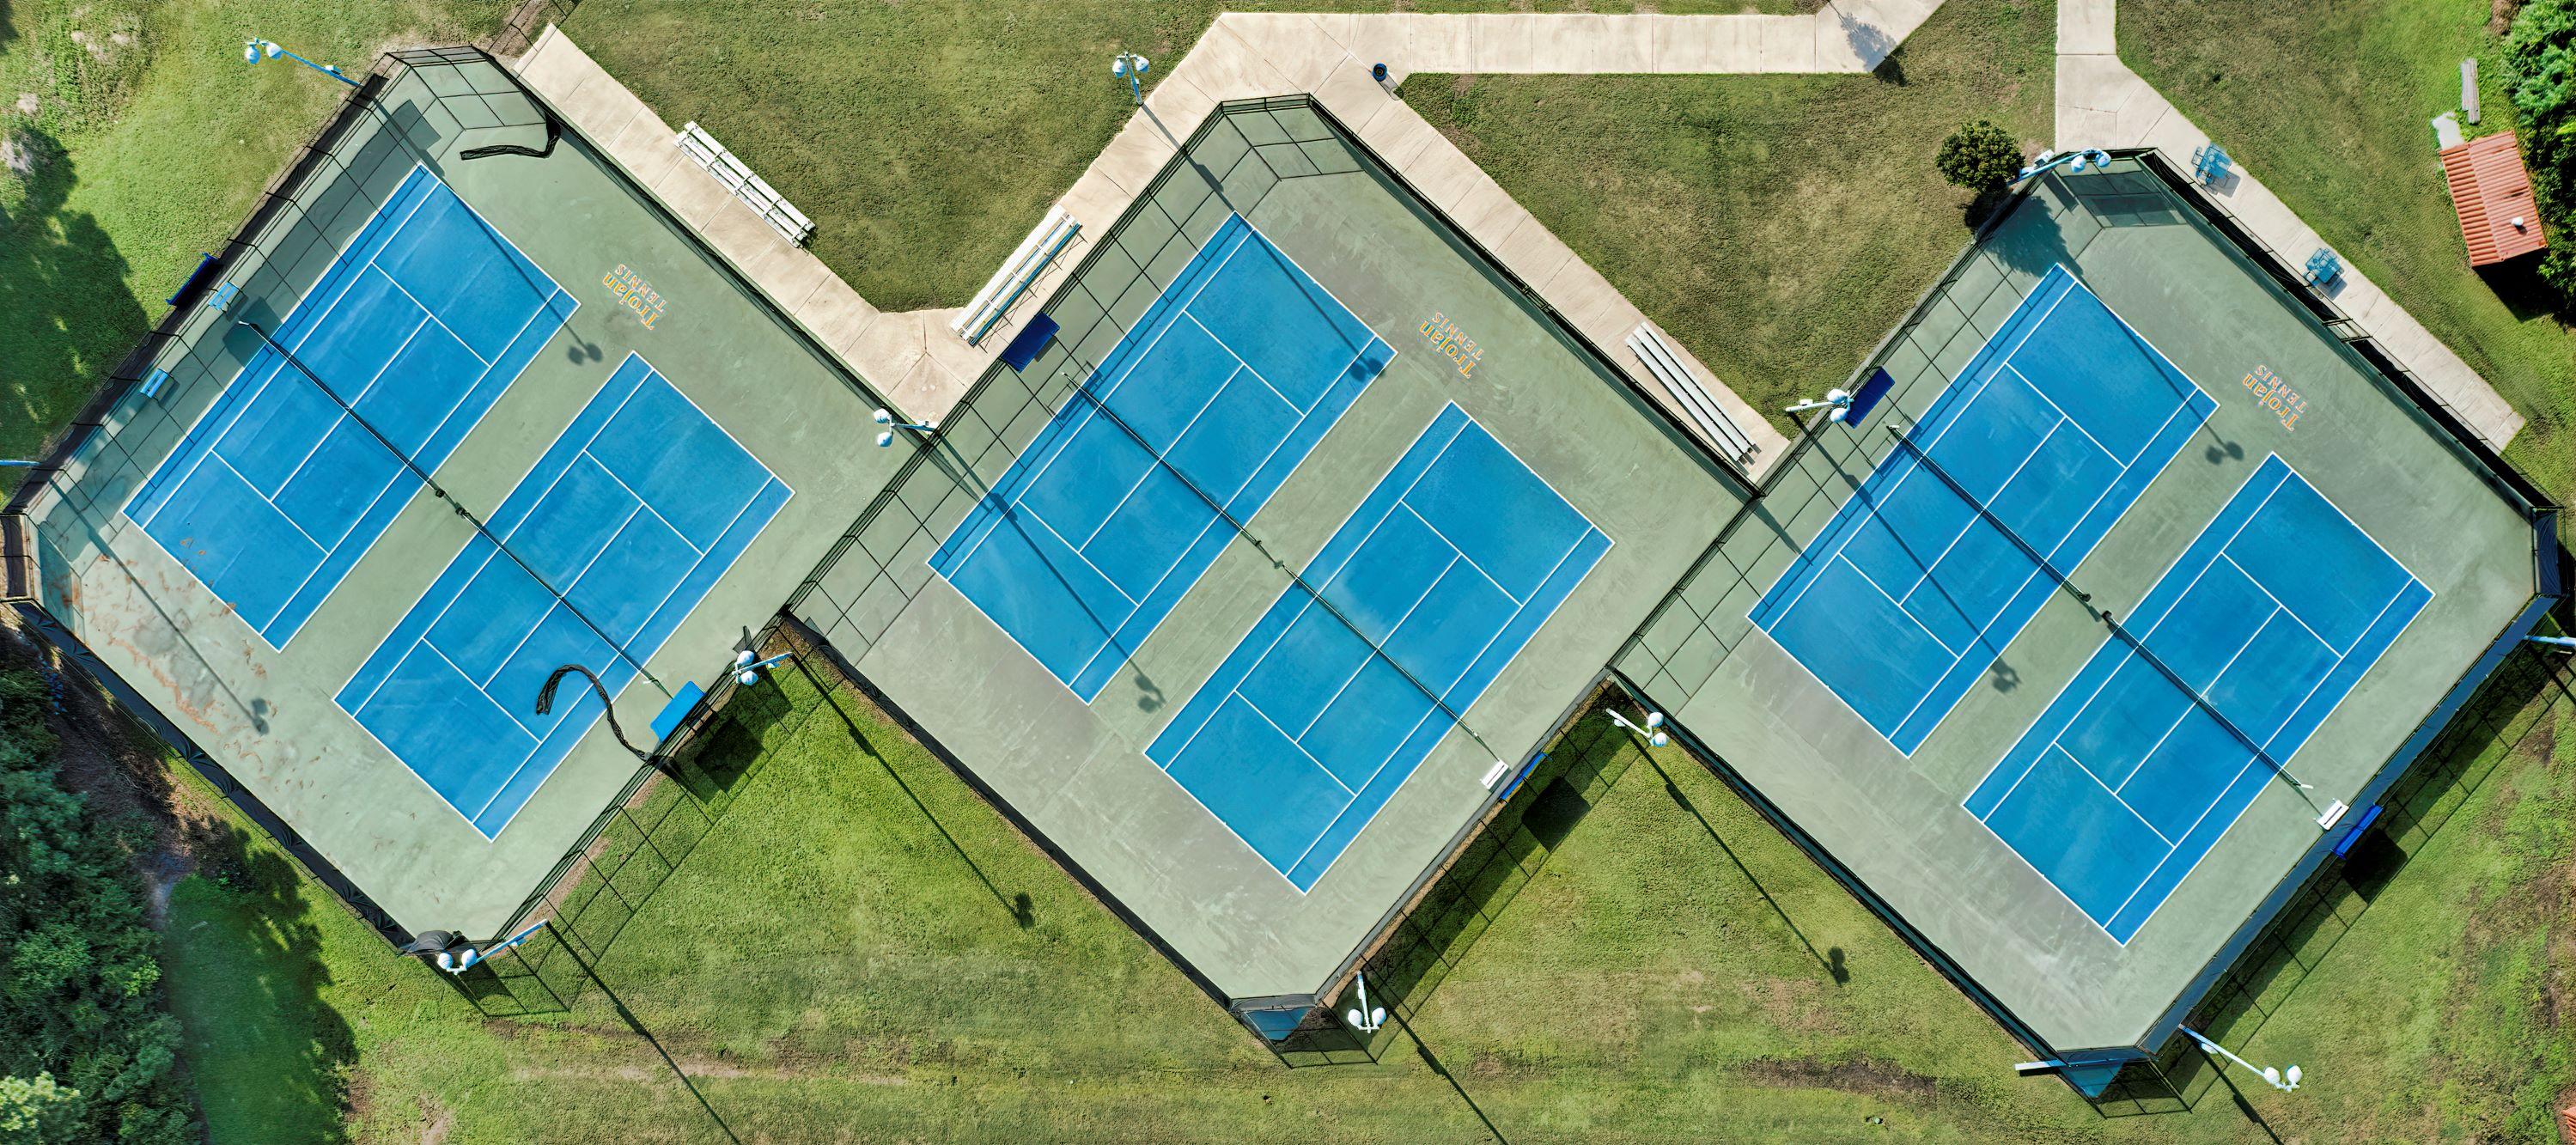 Tennis Courts-dji.jpeg